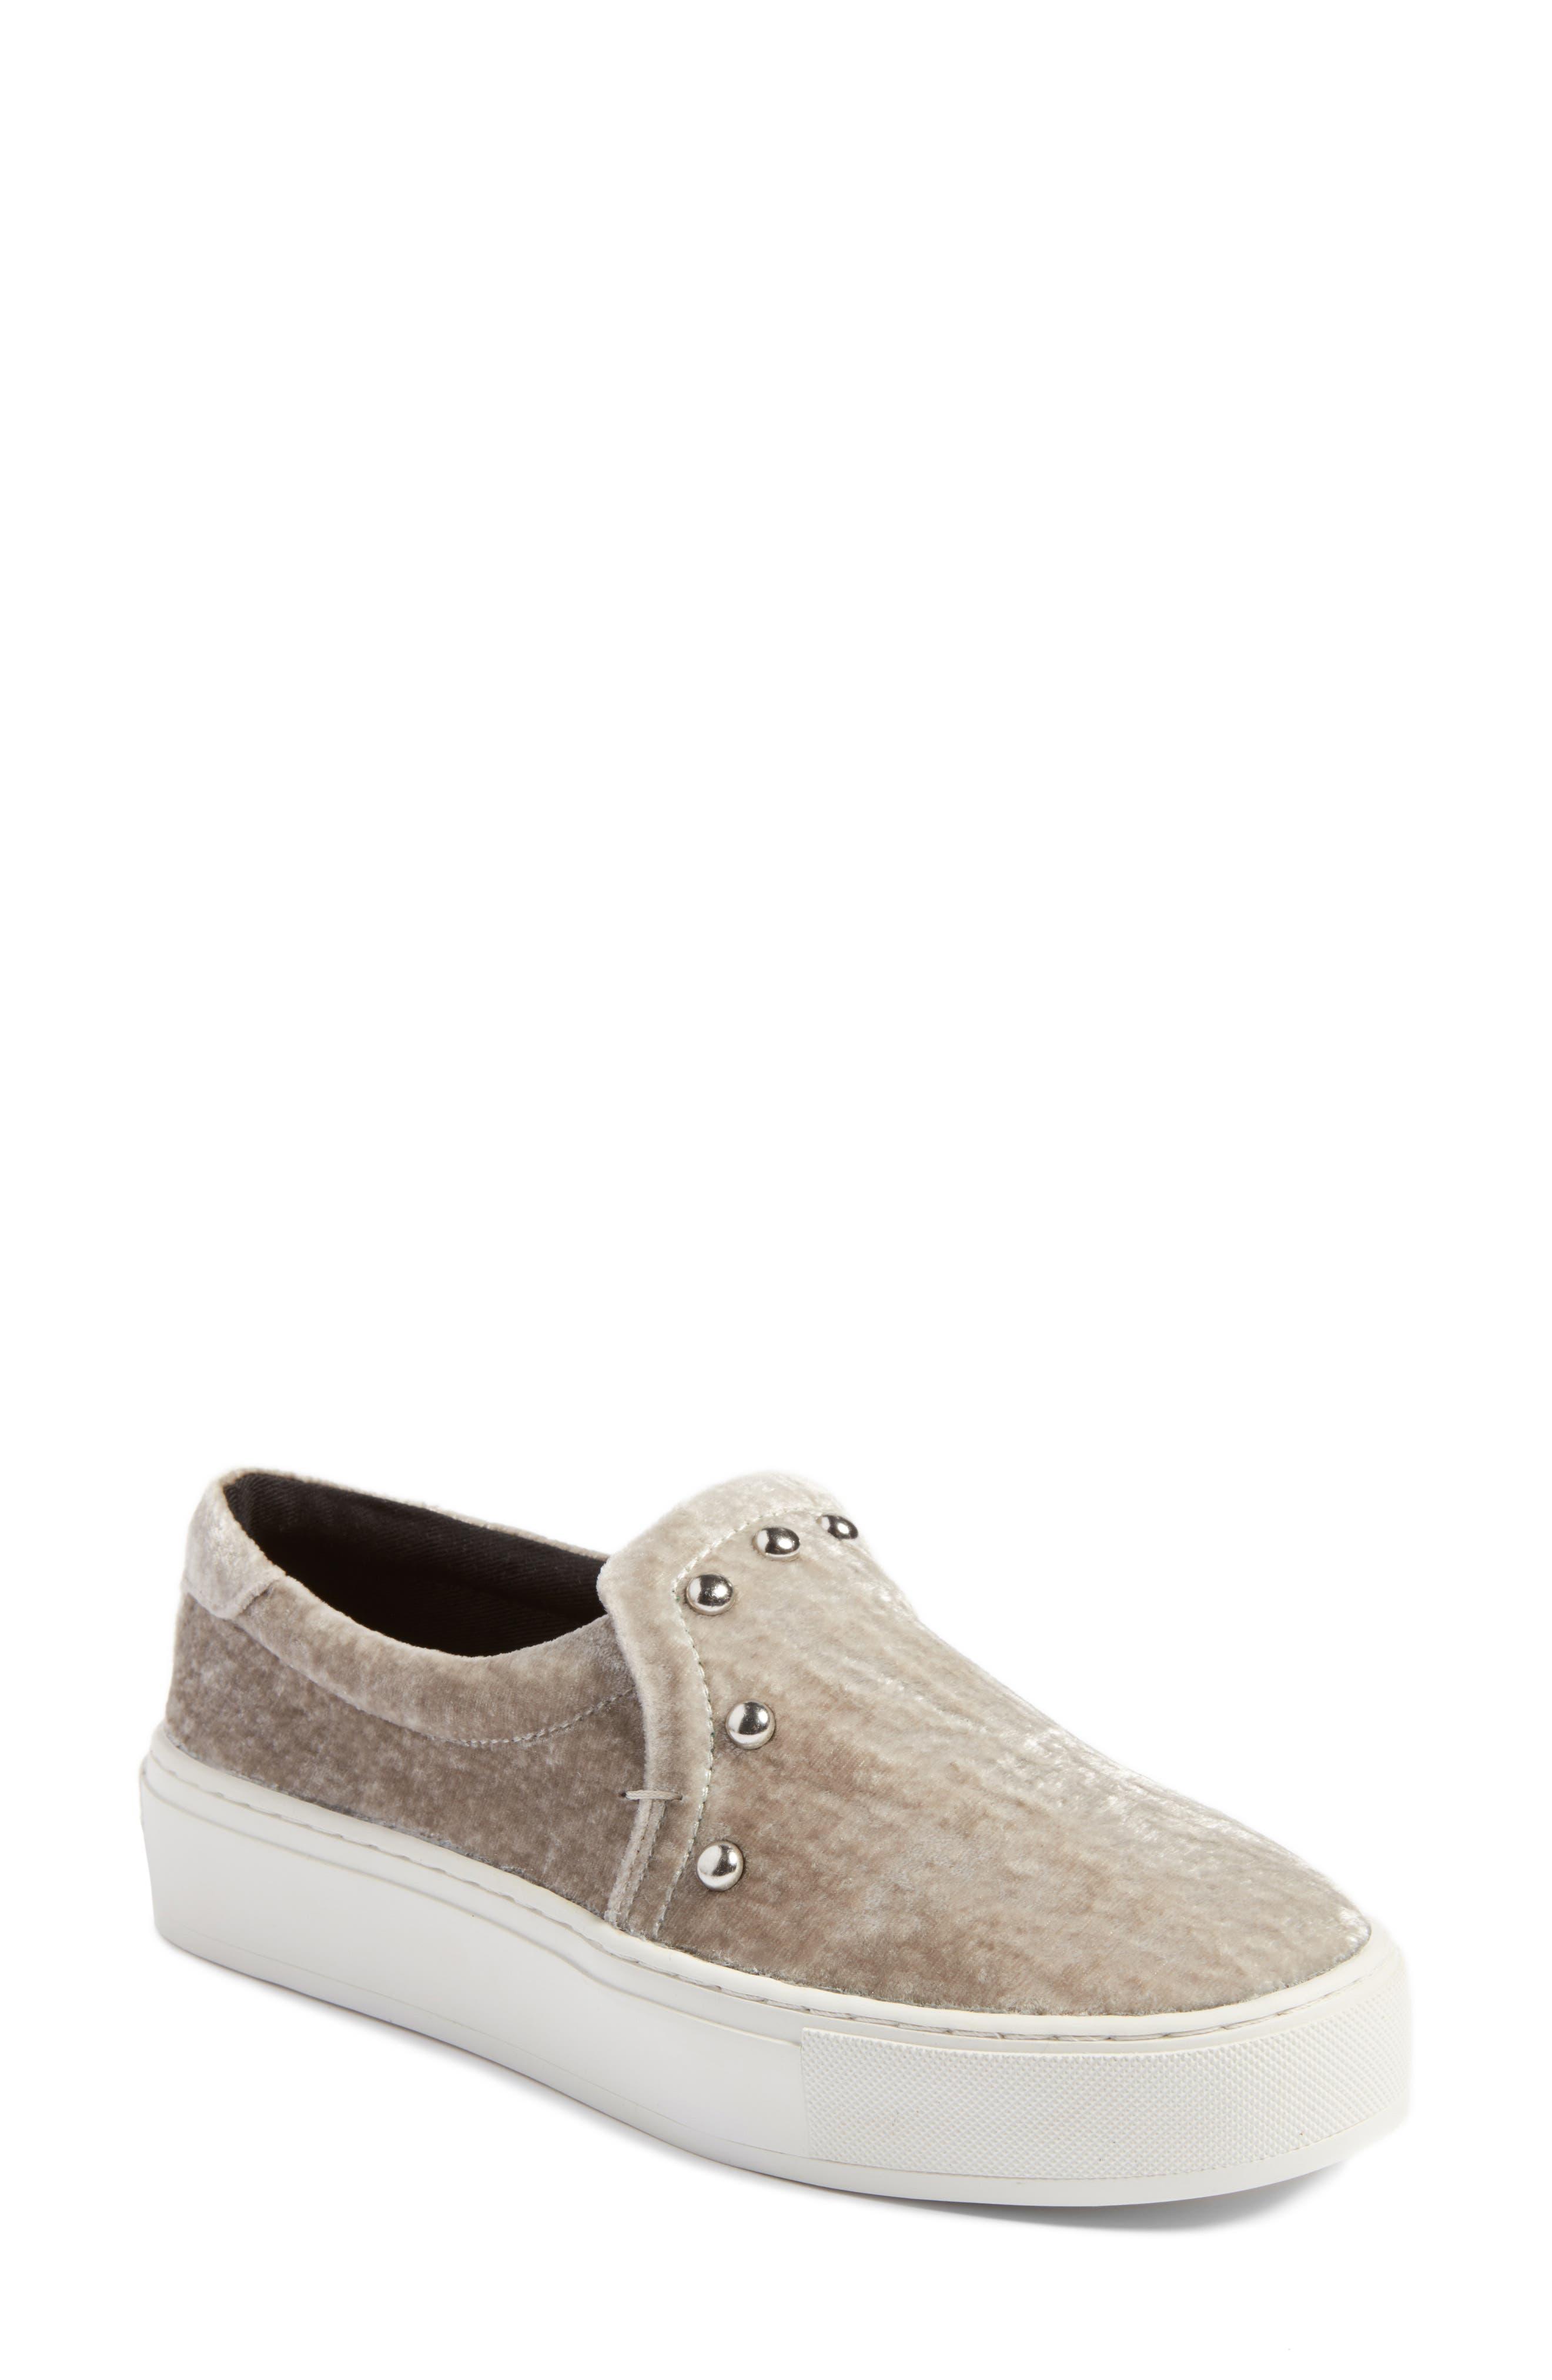 REBECCA MINKOFF Noelle Slip-On Platform Sneaker